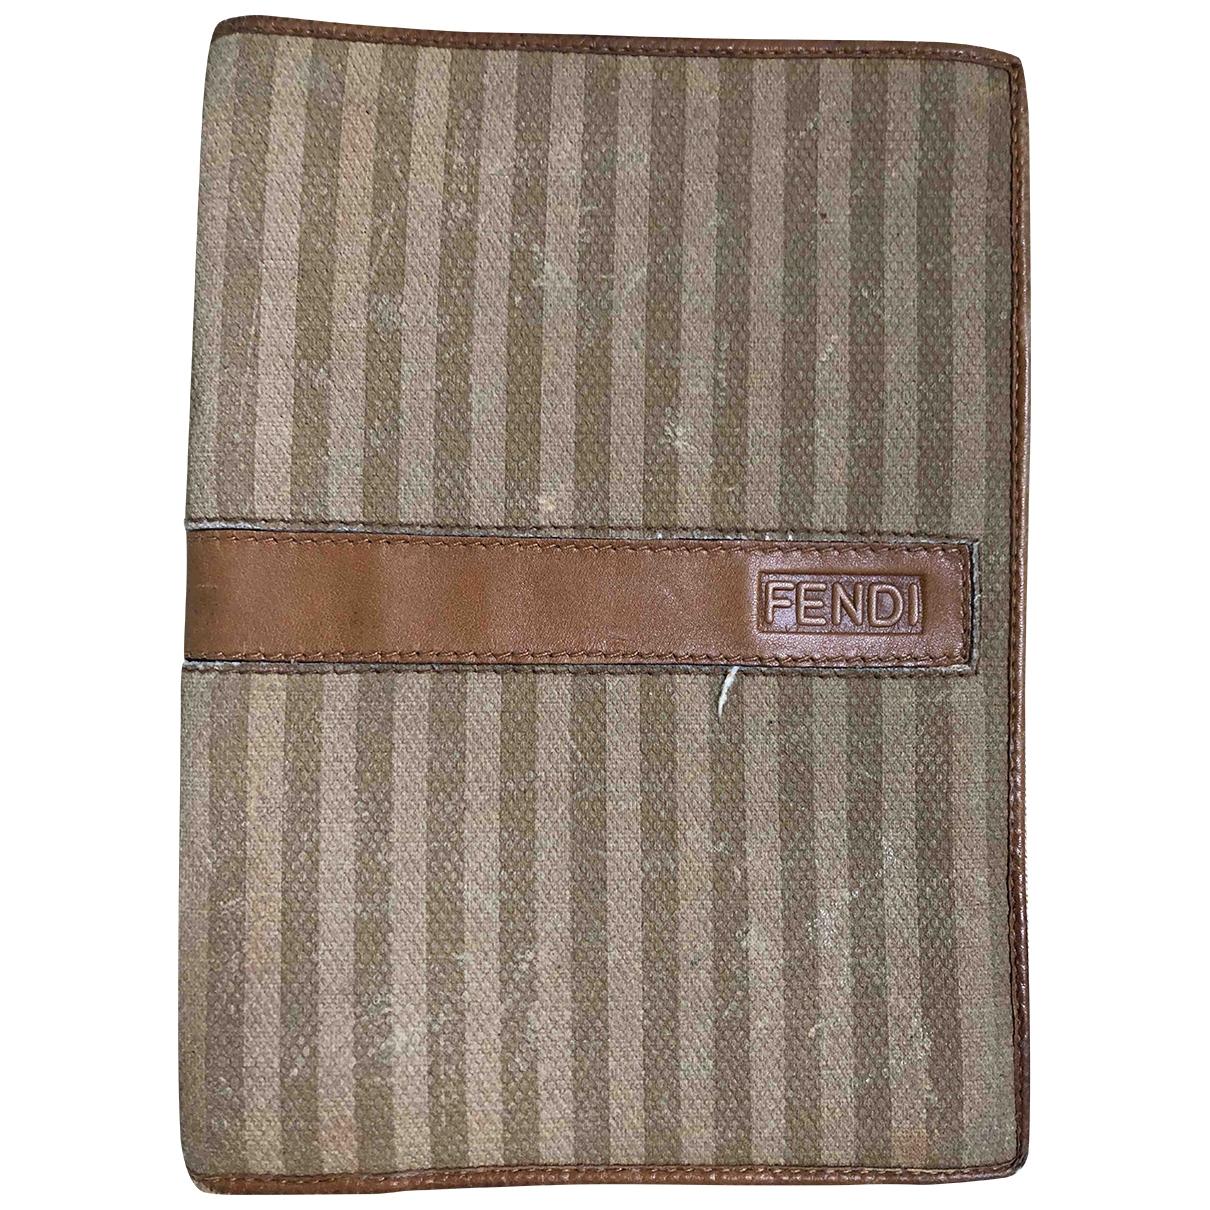 Fendi \N Beige Cloth wallet for Women \N